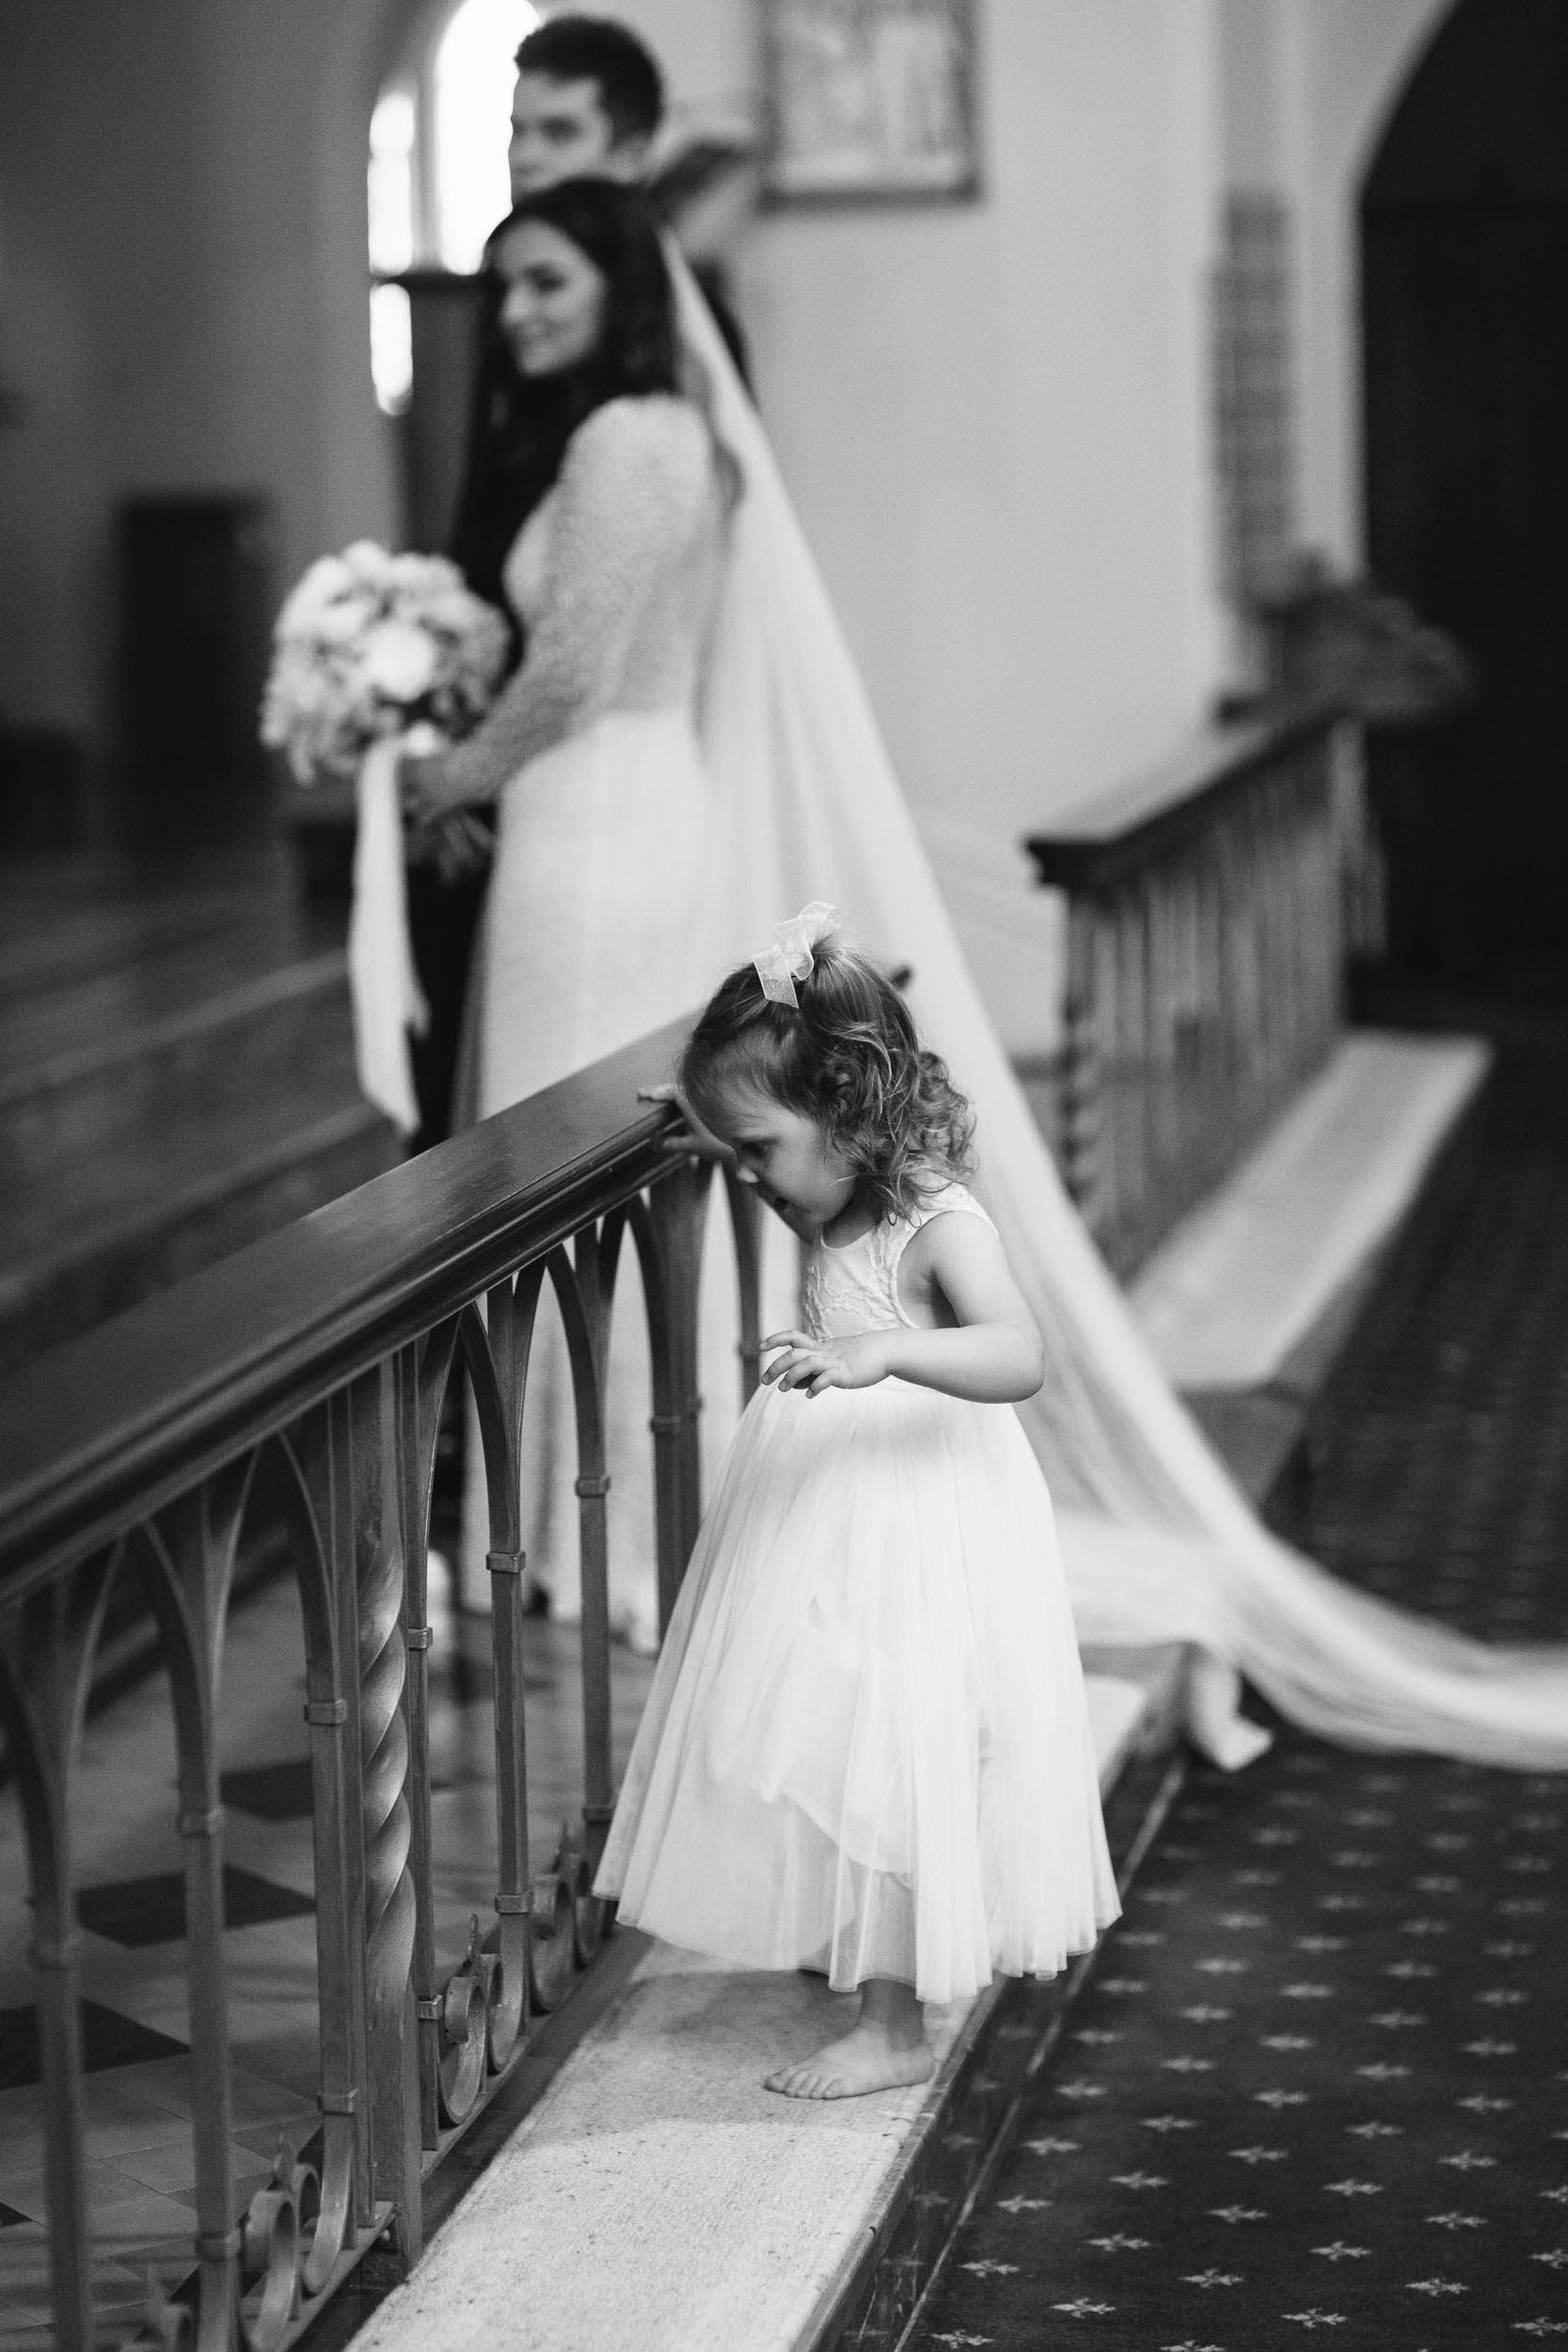 Kas-Richards-Wedding-Photographer-Melbourne-City-Wedding-Alto-Event-Space-Jane-Hill-Bridal-Gown-31.jpg